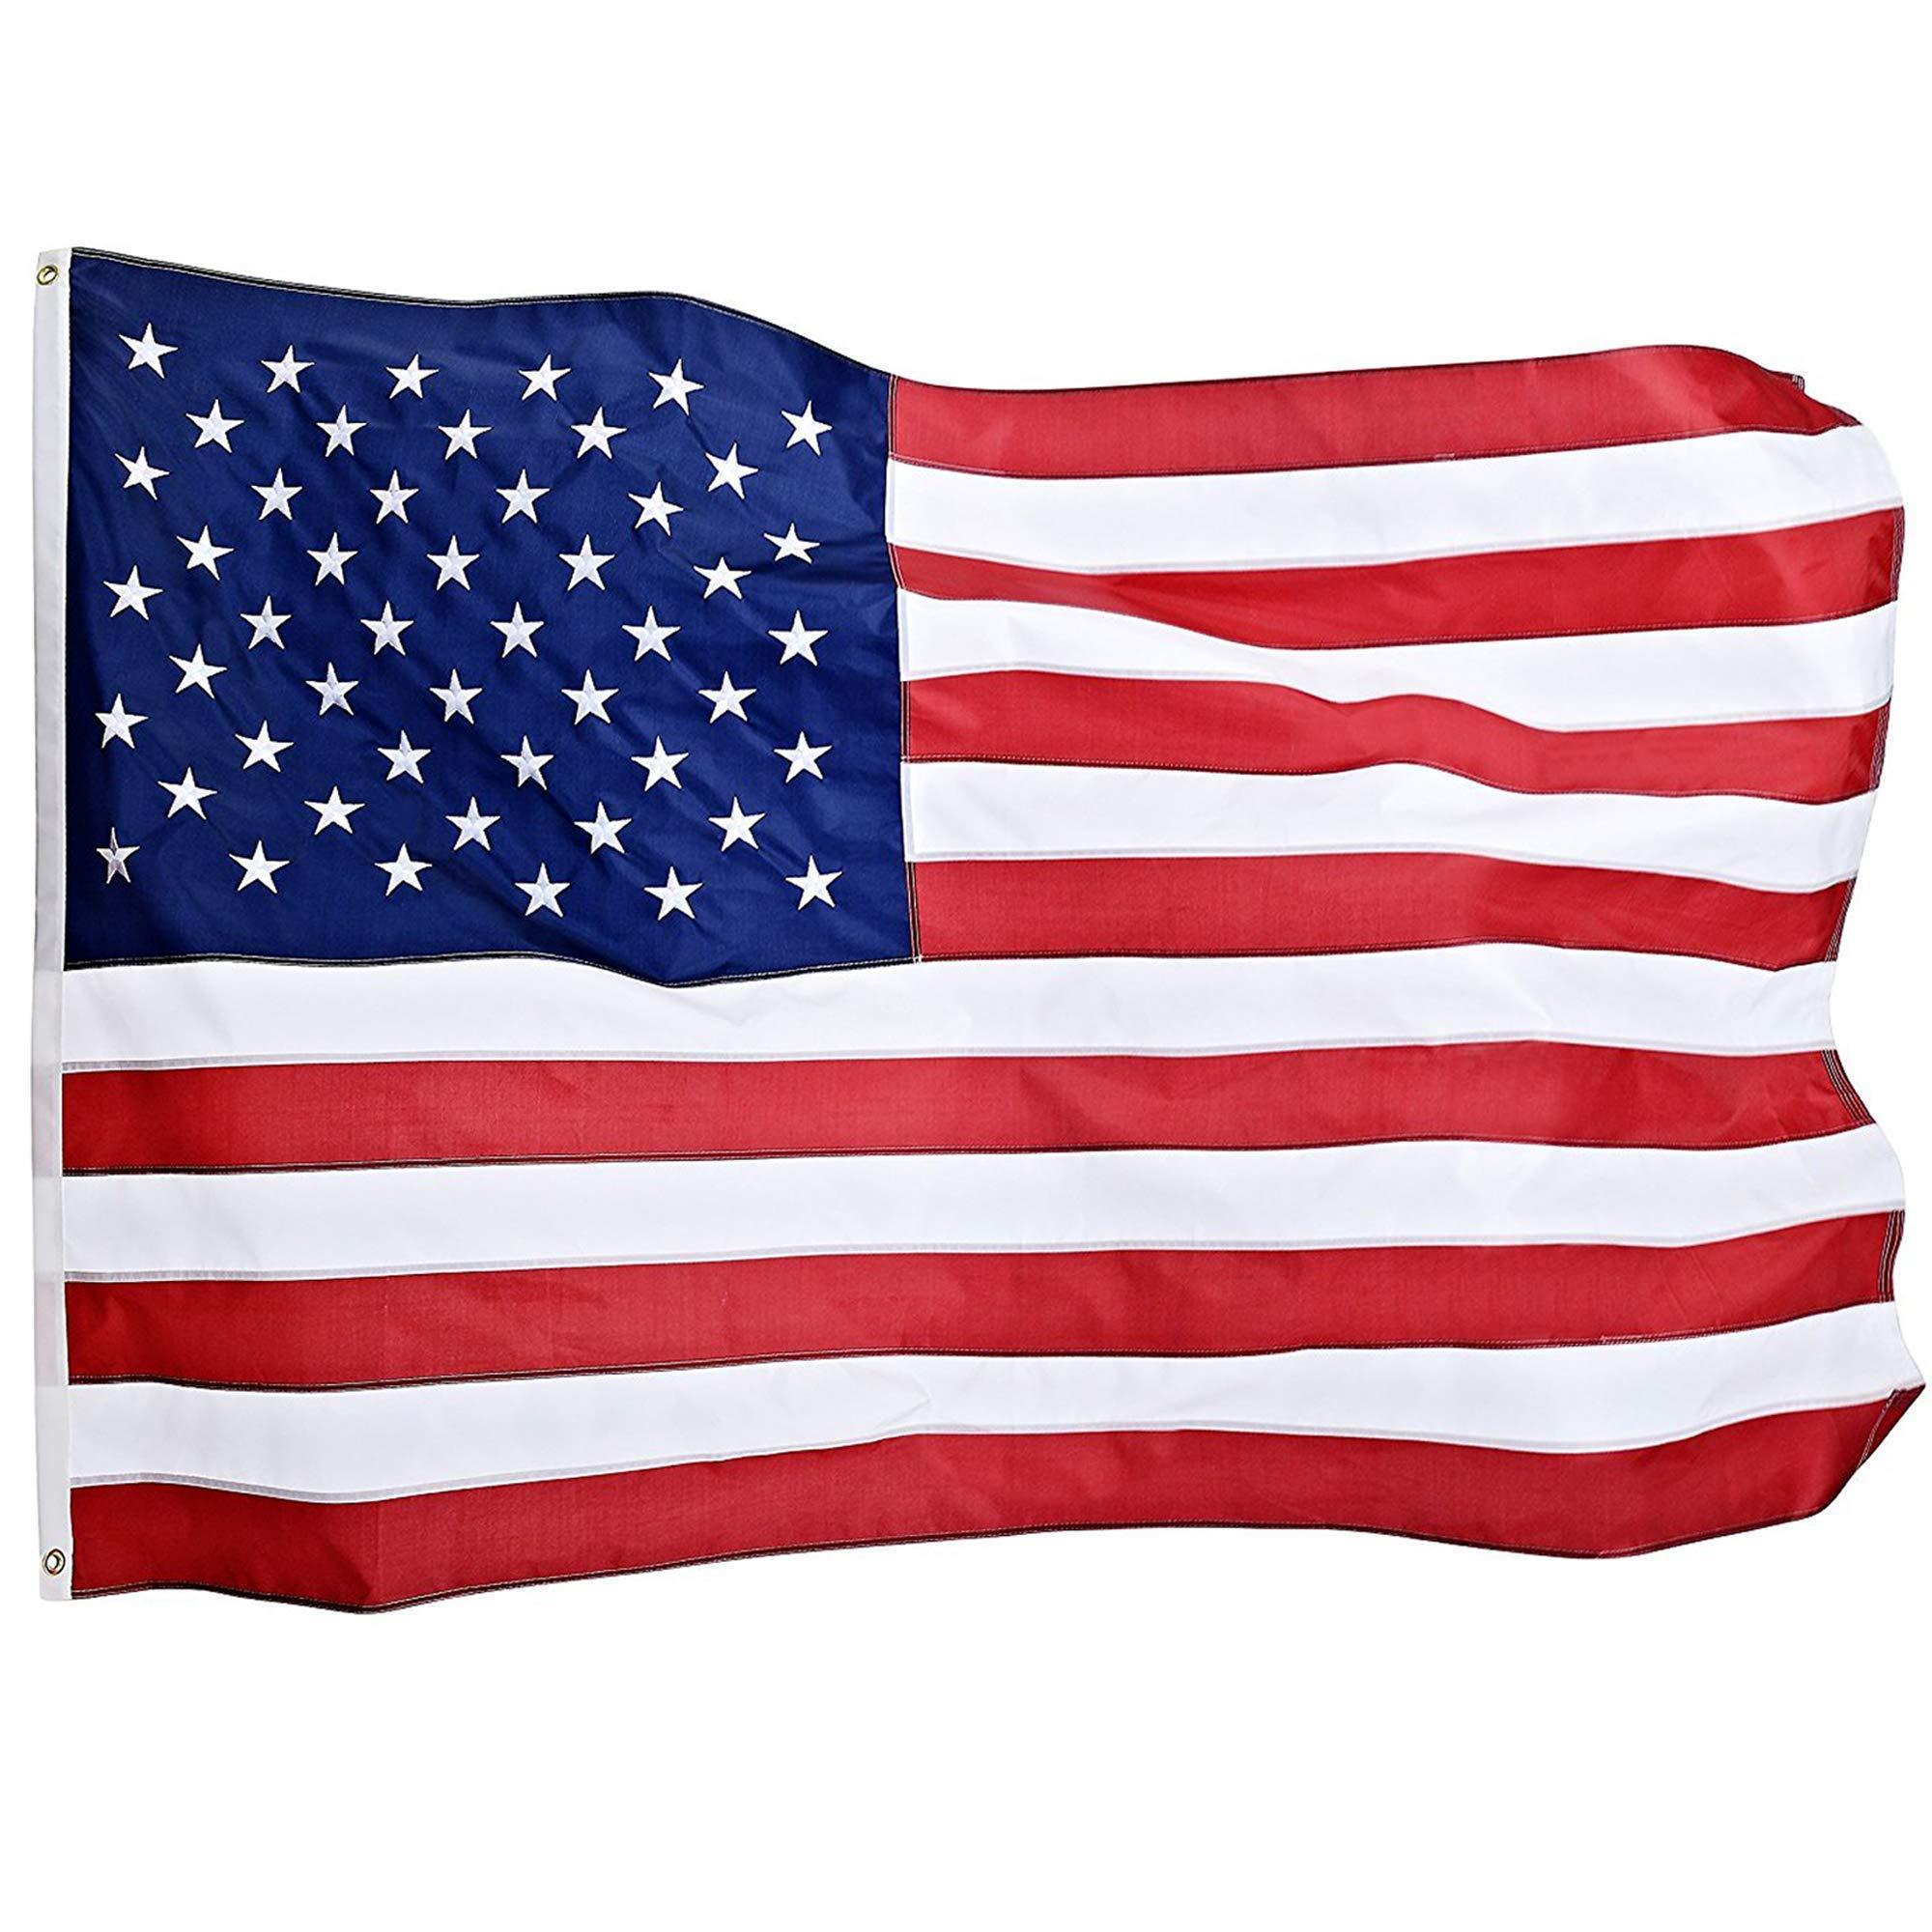 8c06afa5c78 Jetlifee American Flag 6x10 Ft by US Veterans Owned Biz. Heavyweight  Embroidered Stars Sewn Stripes